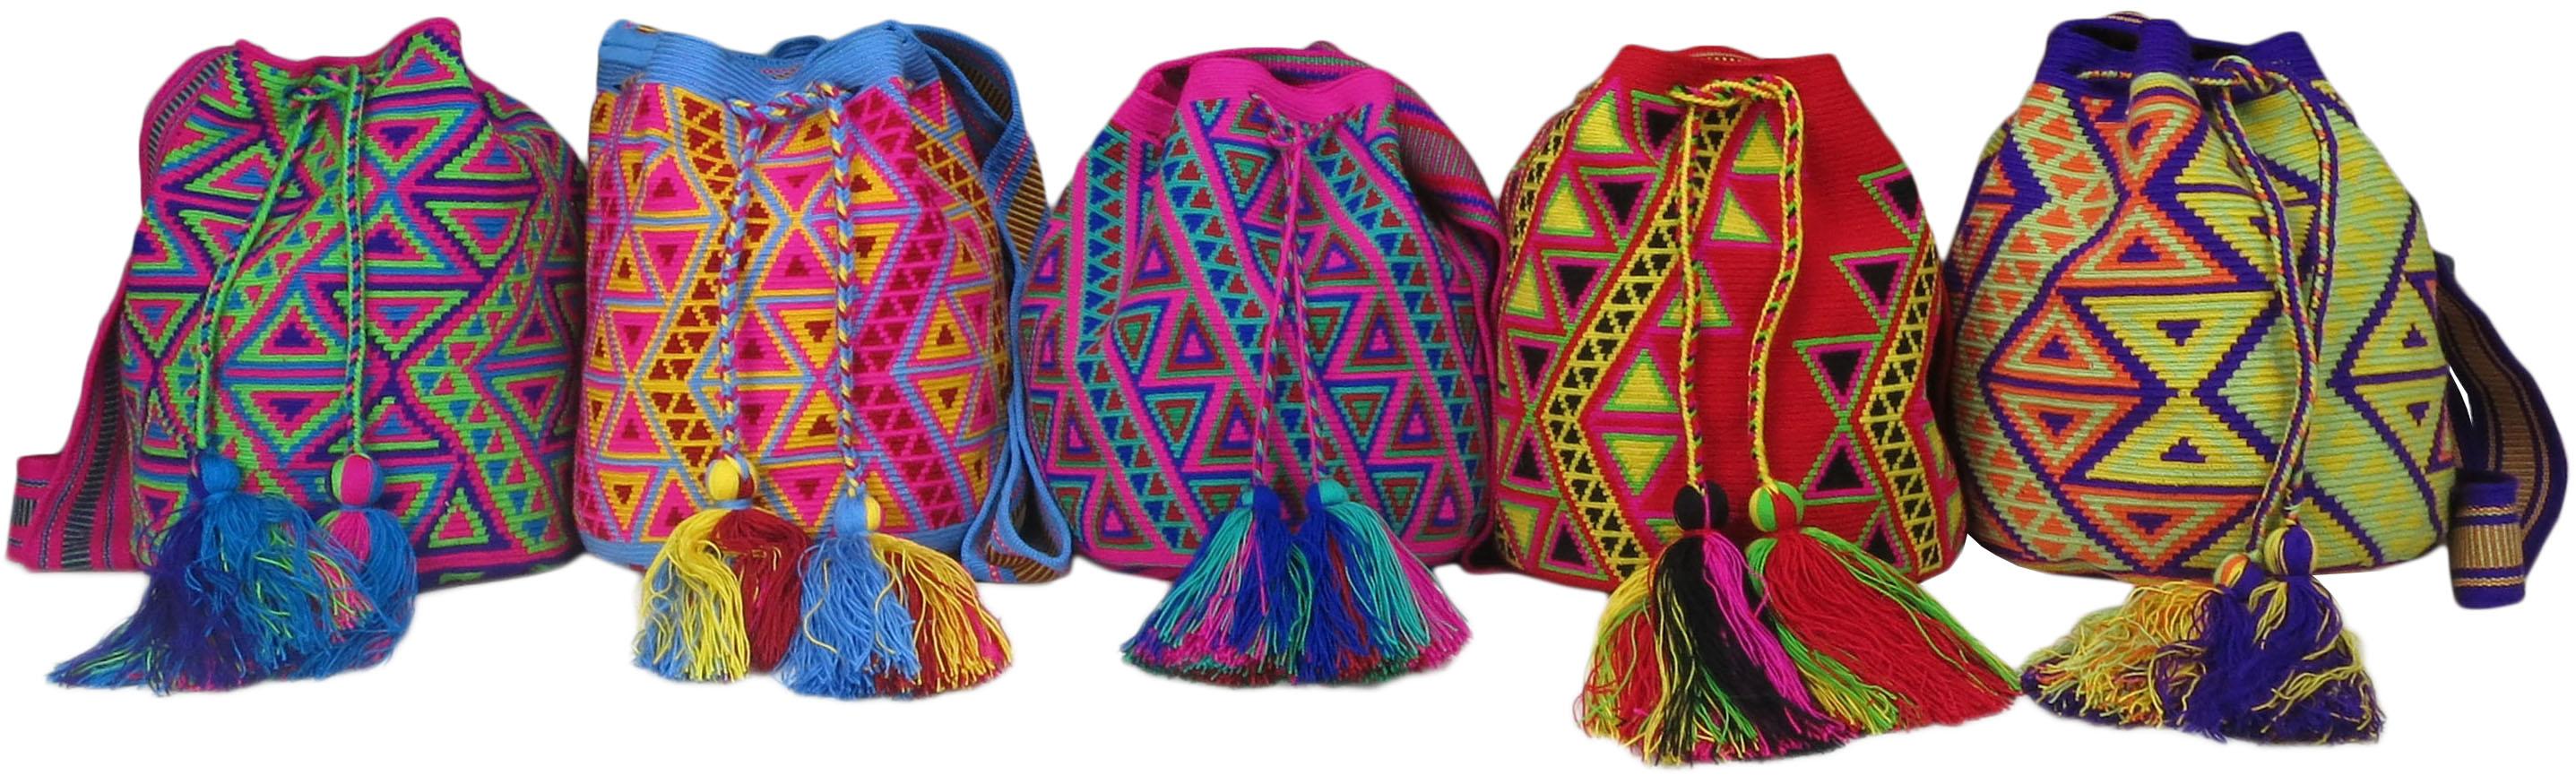 Croche Handbags